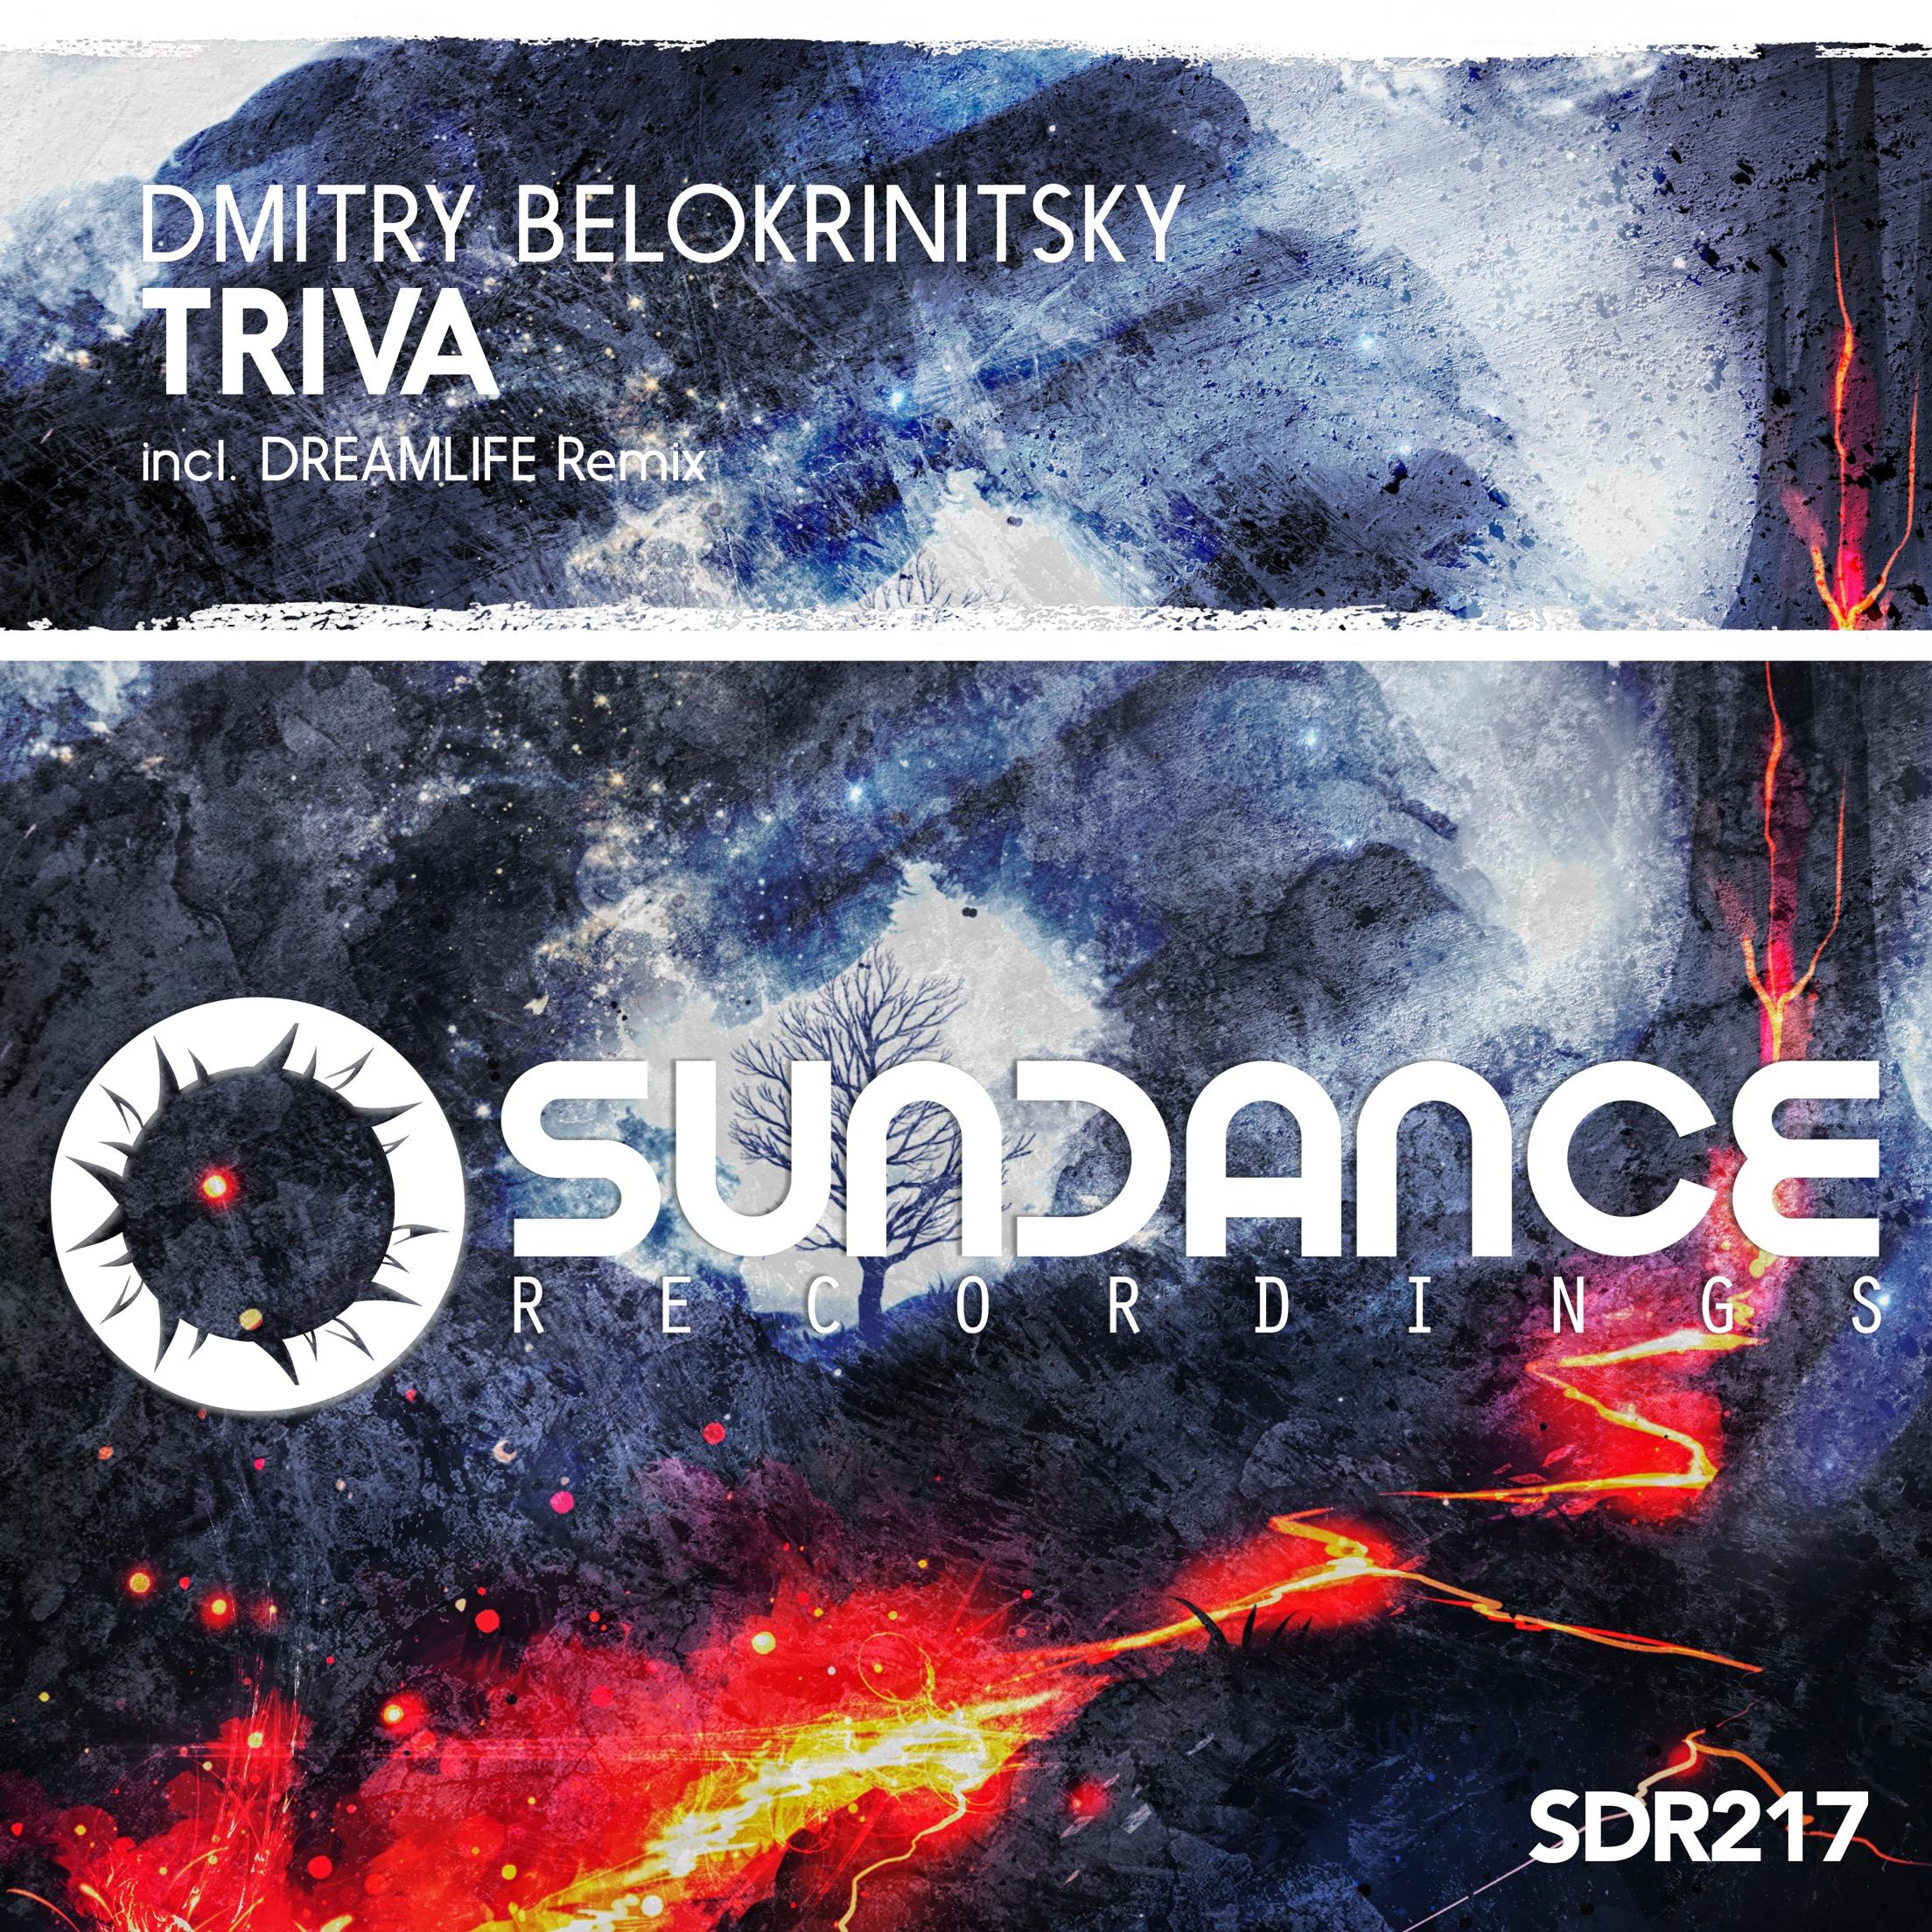 Dmitry Belokrinitsky - Triva (DreamLife Remix)